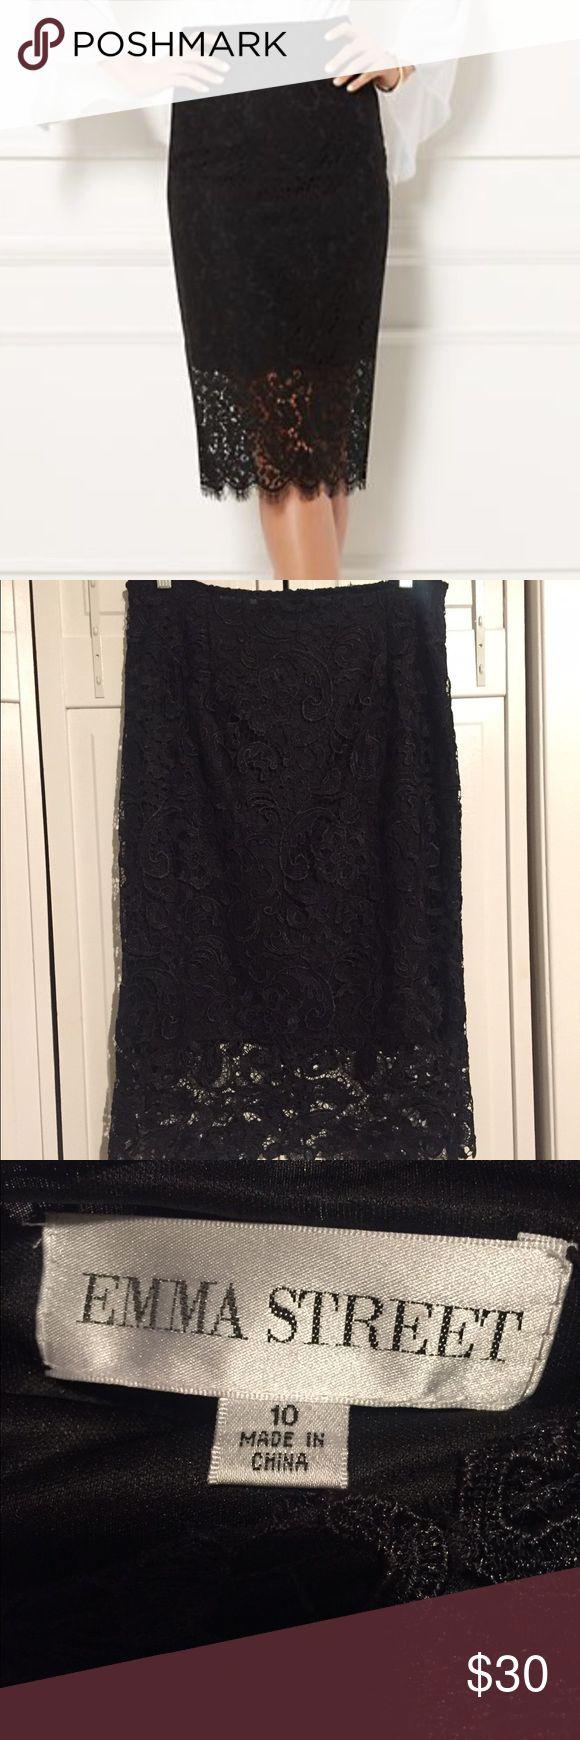 Emma street lace pencil skirt Emma street lace pencil skirt brand new never worn Skirts Midi